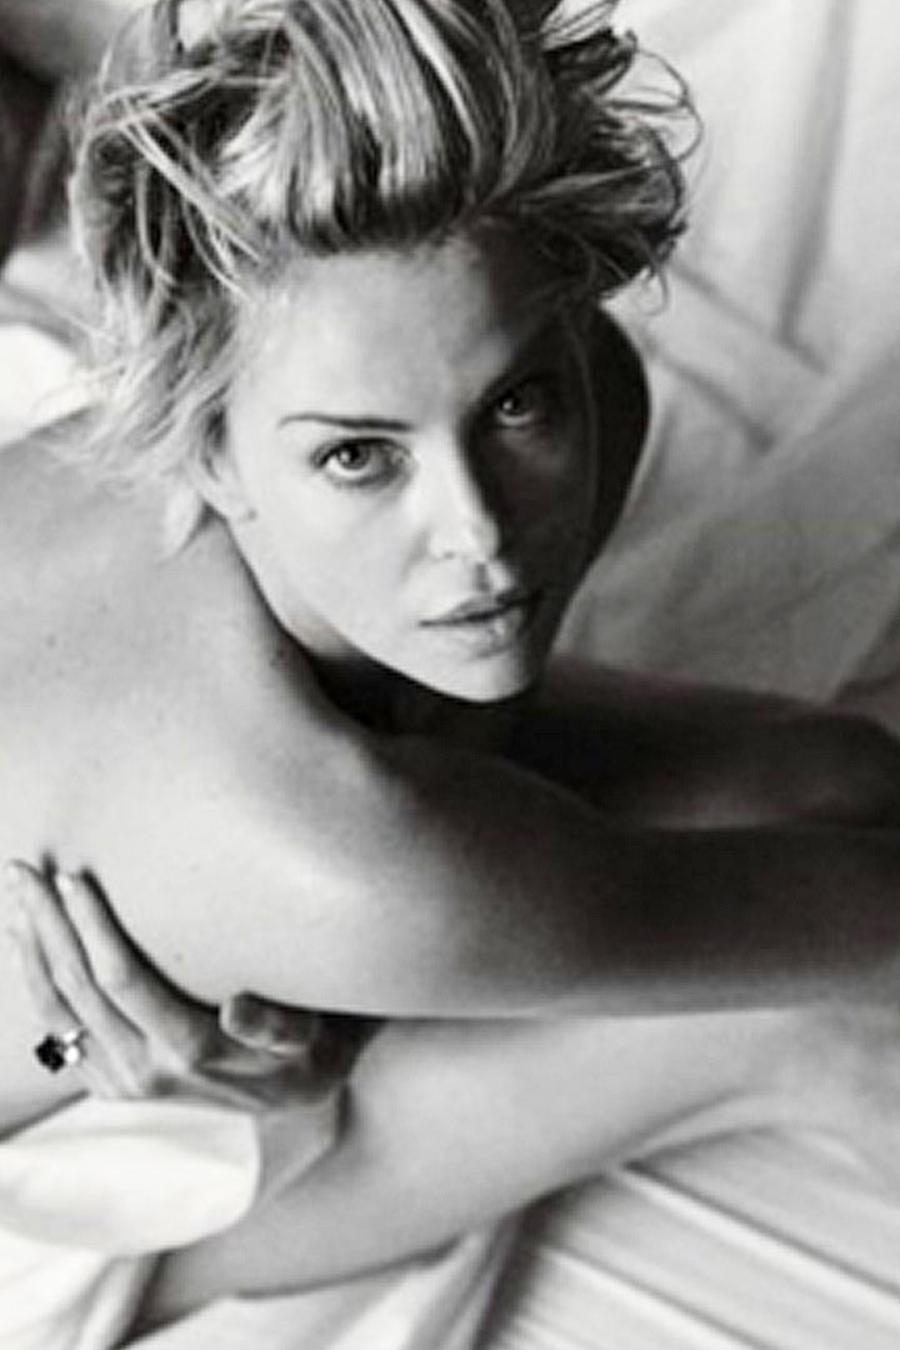 charlize theron desnuda en fotos